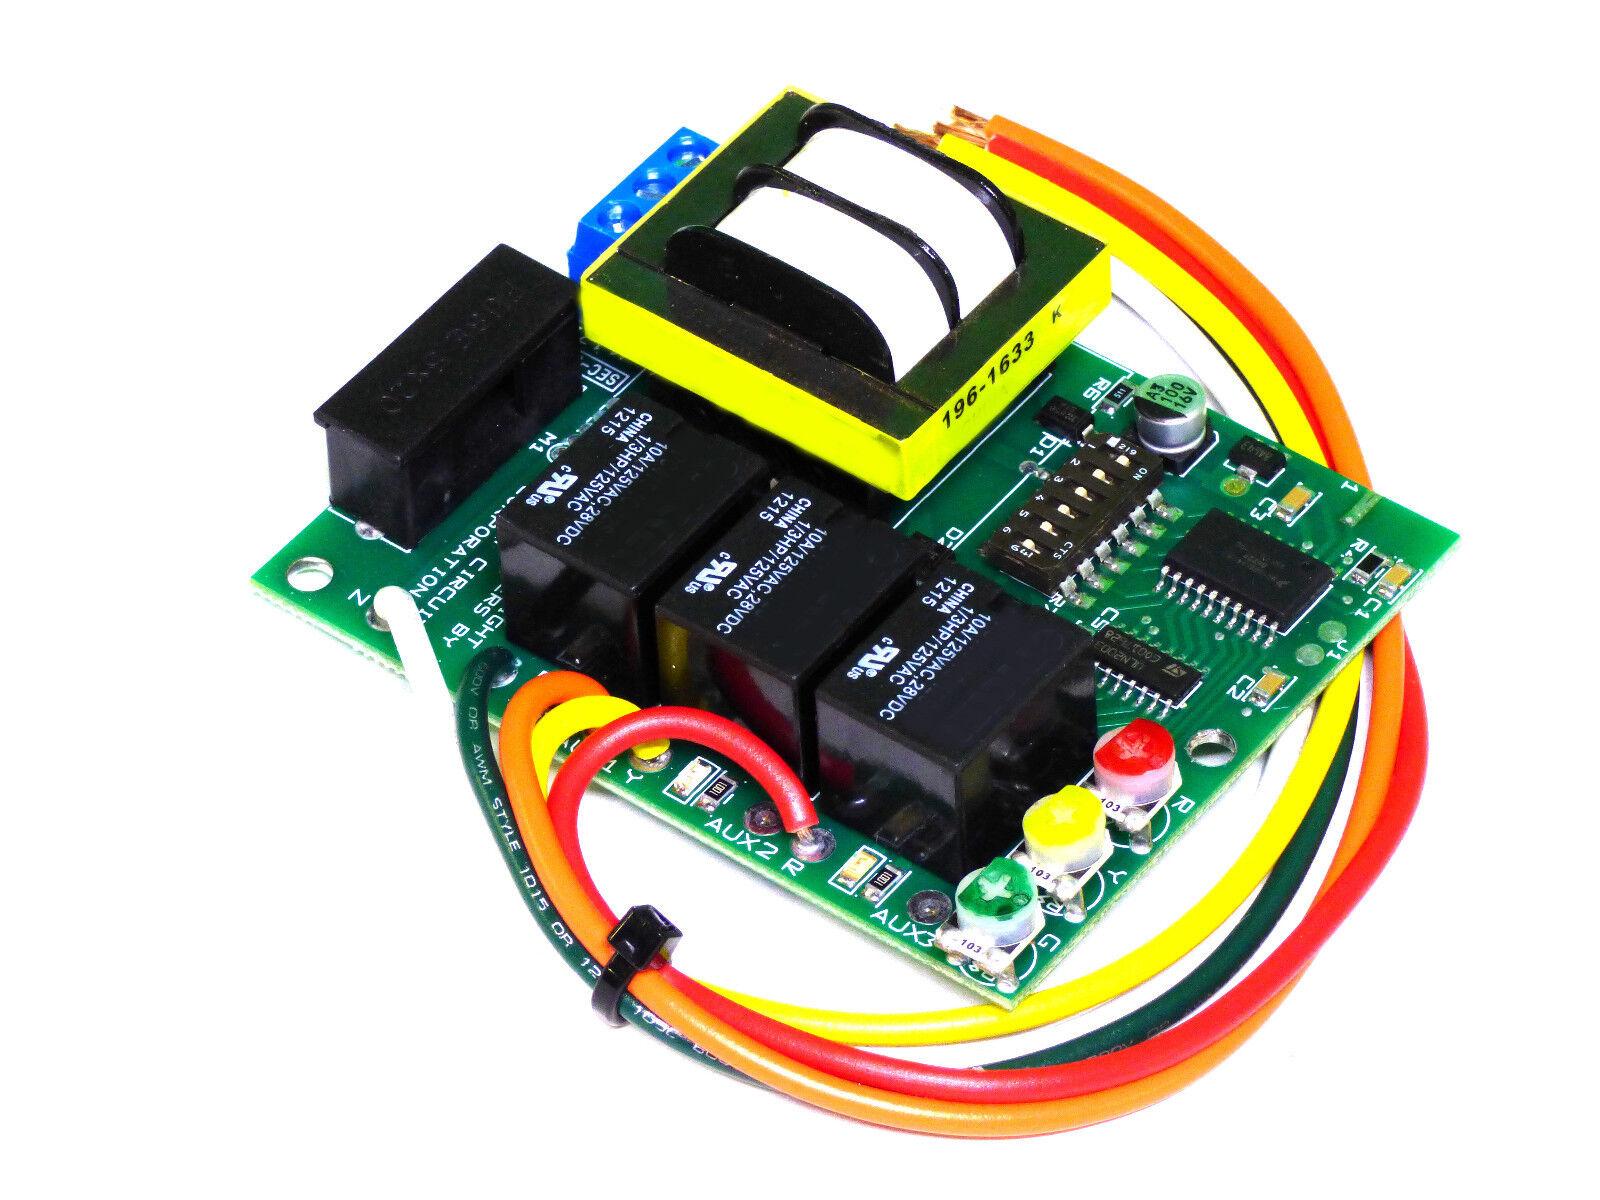 Traffic Light Controller &  Sequencer  3 Lite  Sl-3008 120 V., Sl-3009 240 V.